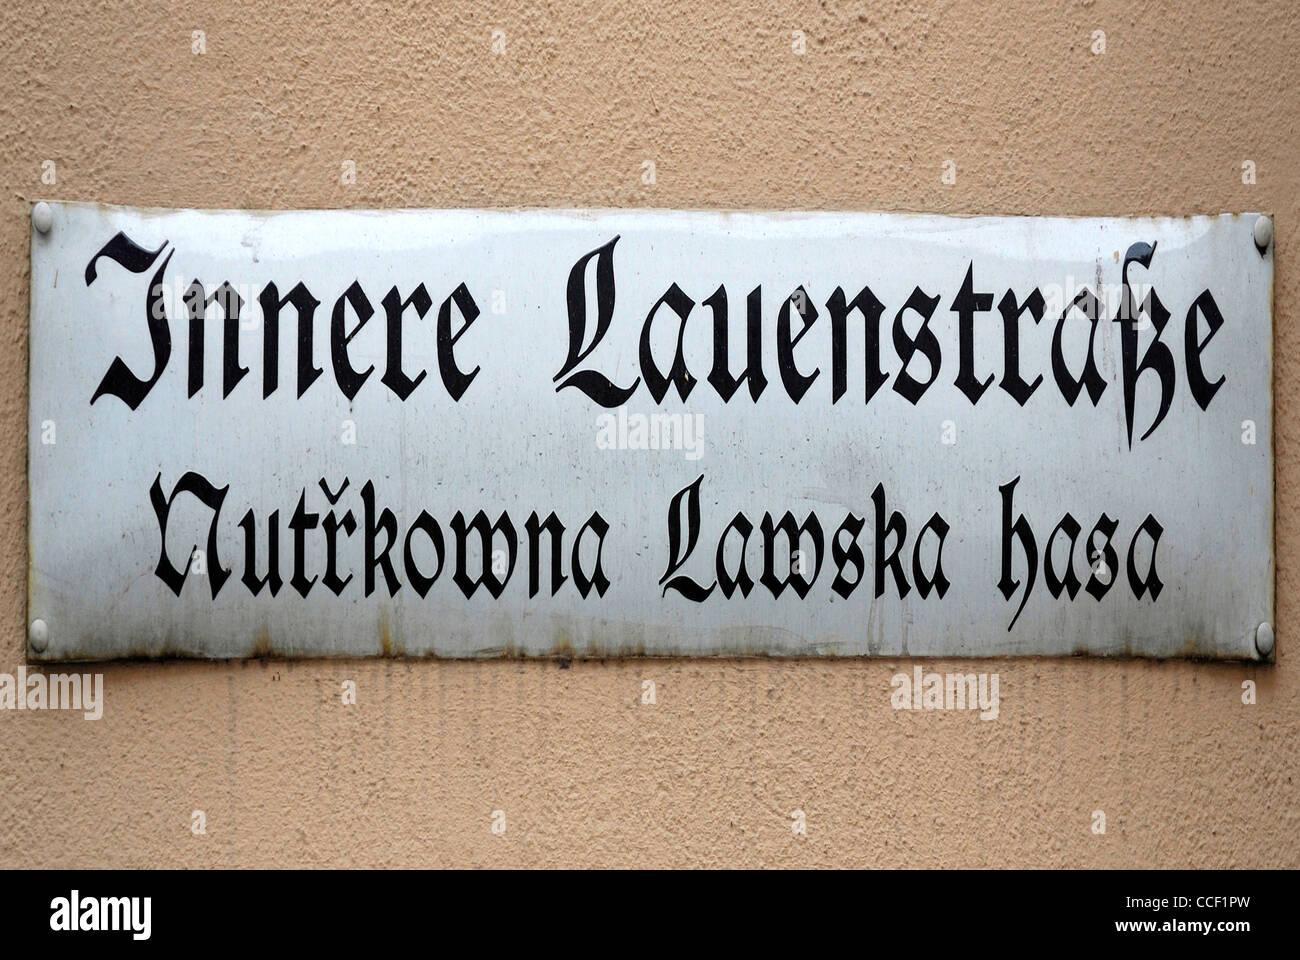 Street sign of Bautzen in German and Sorbian language at the Innere Lauenstrasse - Nutrkowna Lawska hasa. - Stock Image